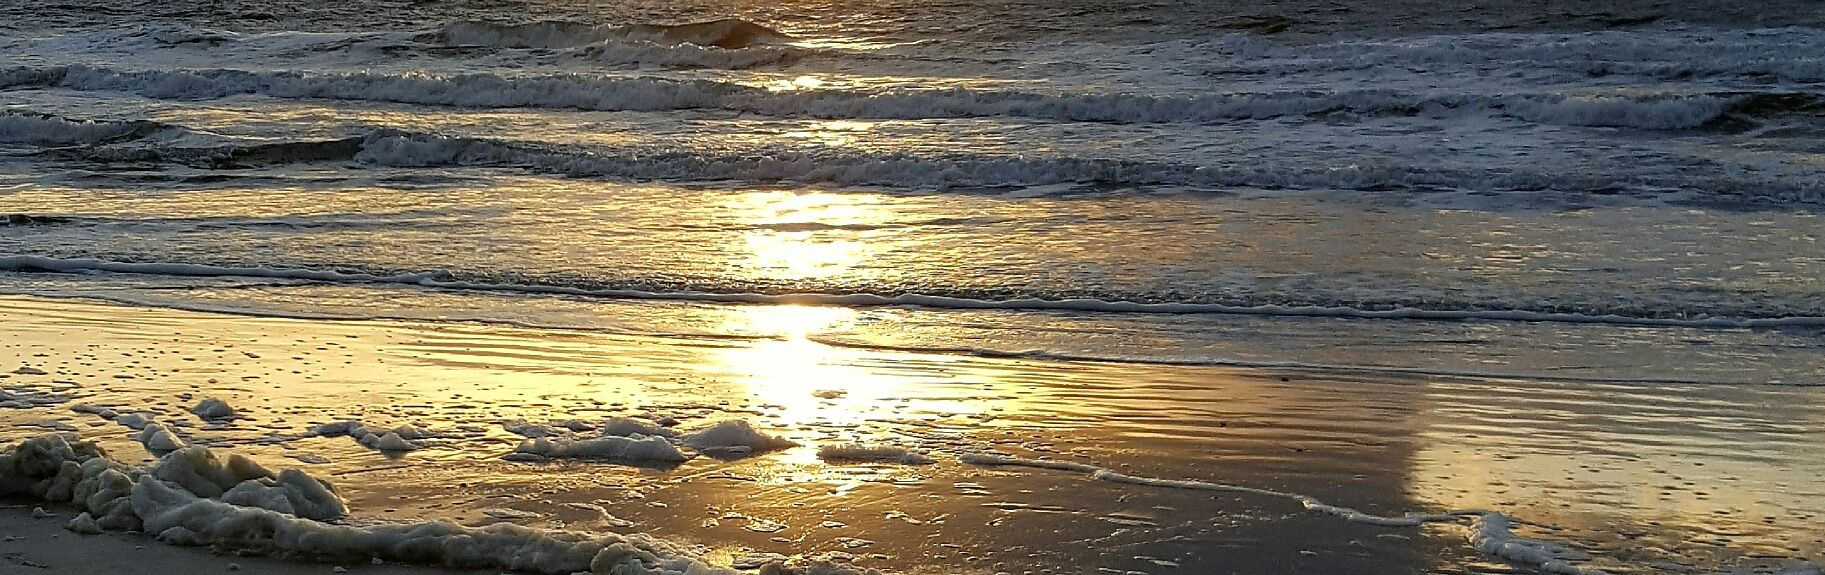 Amelia Landings (Fernandina Beach, Florida, Verenigde Staten)